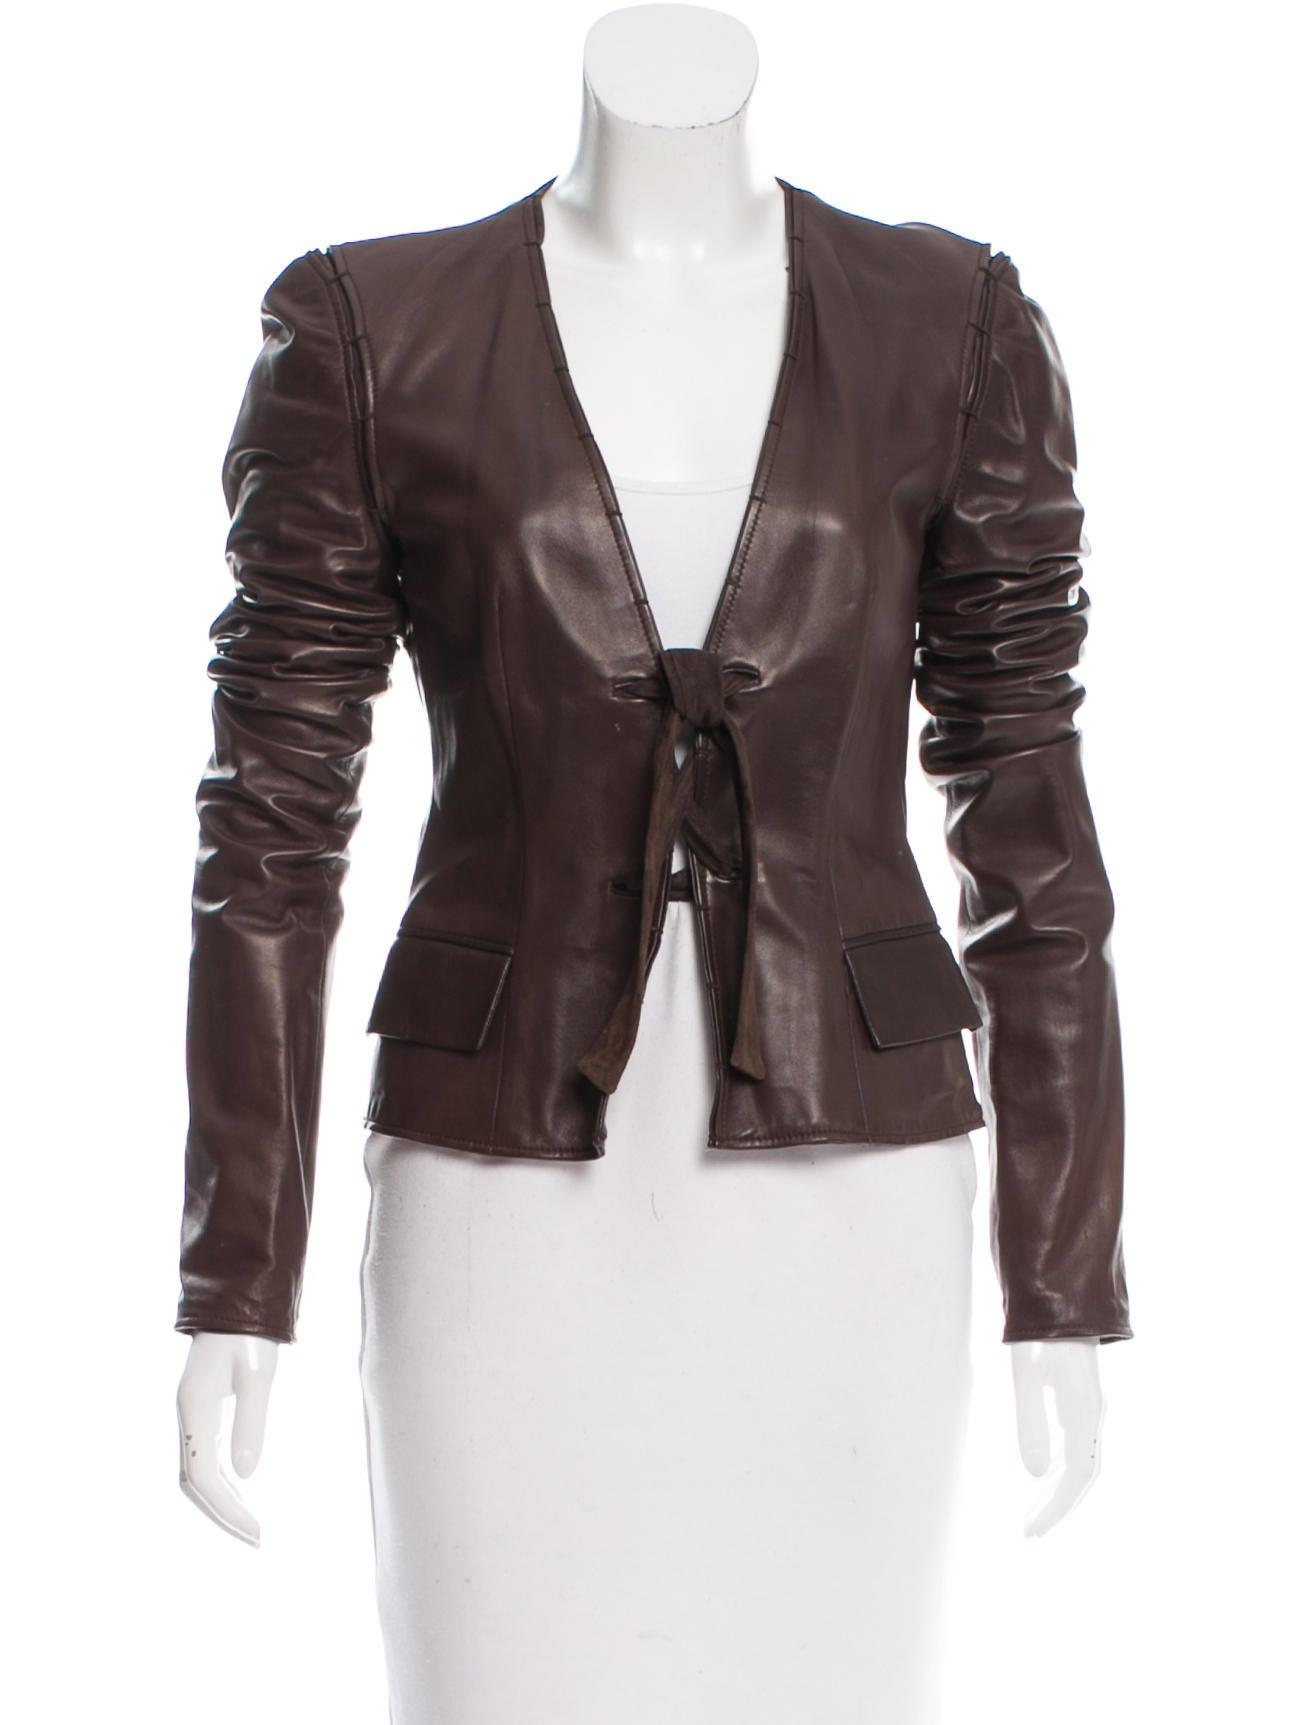 Yves saint laurent leather jacket